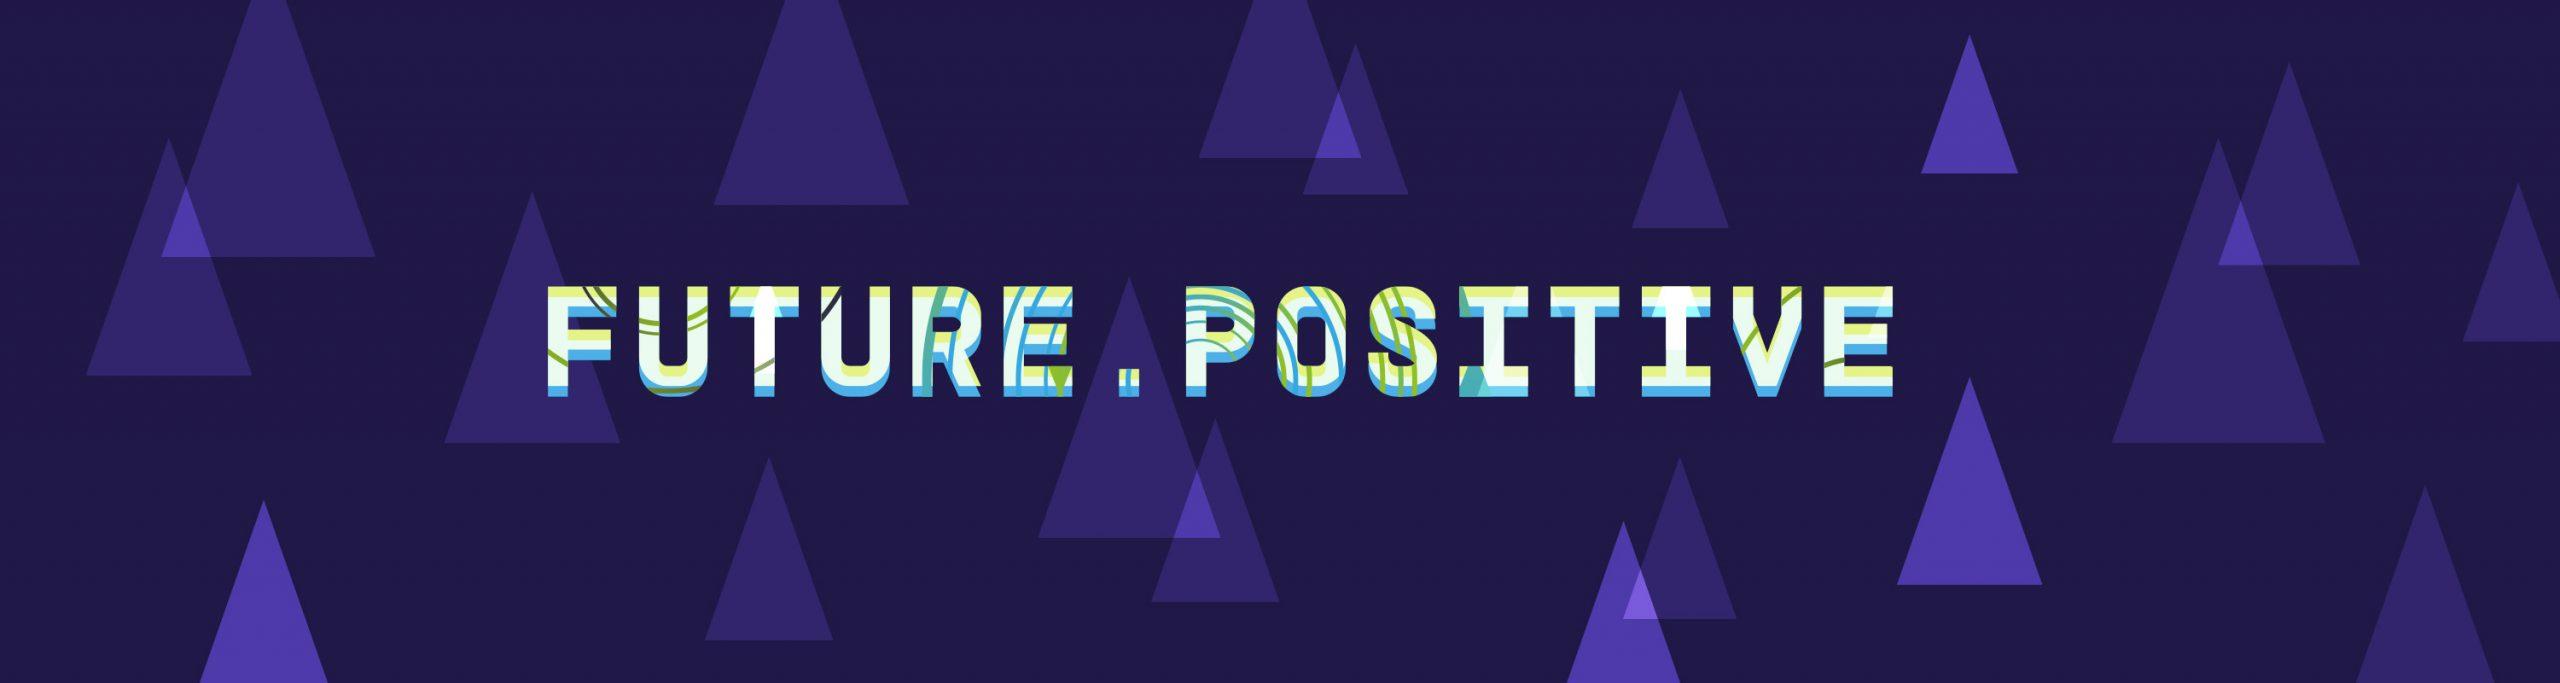 Future_Positive_Start_by_Majormajor